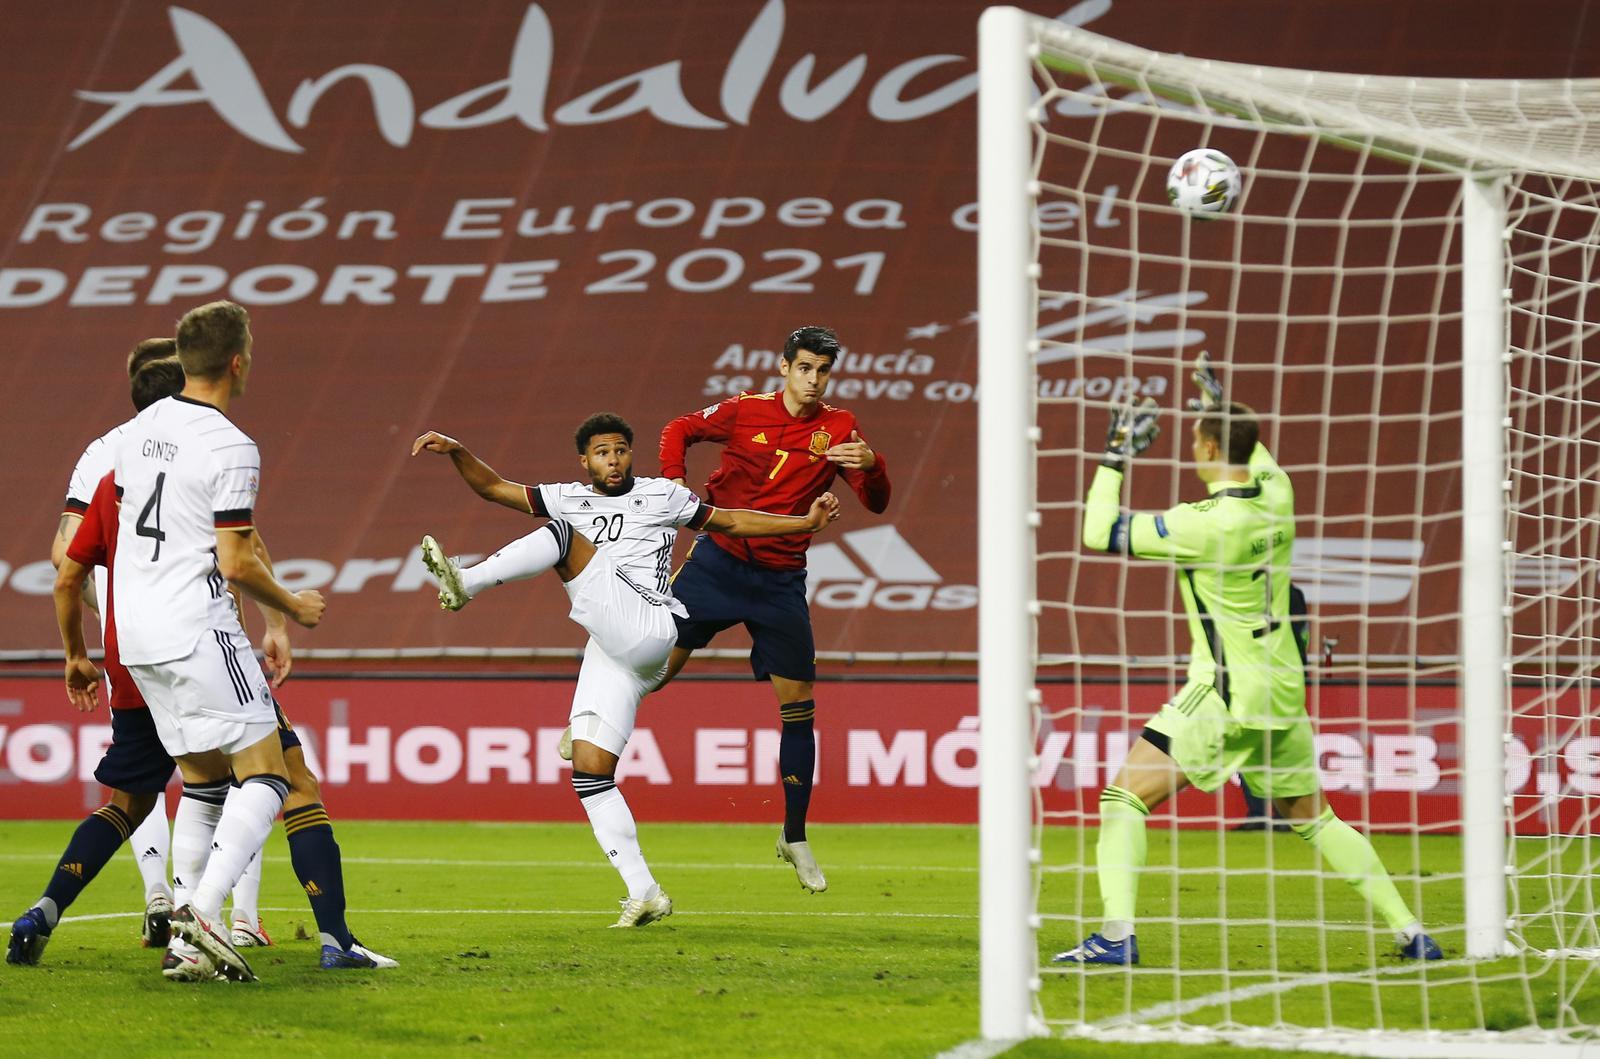 UEFA Nations League - Group D - Spain v Germany - Estadio La Cartuja, Seville, Spain - November 17, 2020 Spain's Alvaro Morata scores their first goal. Photo: Reuters